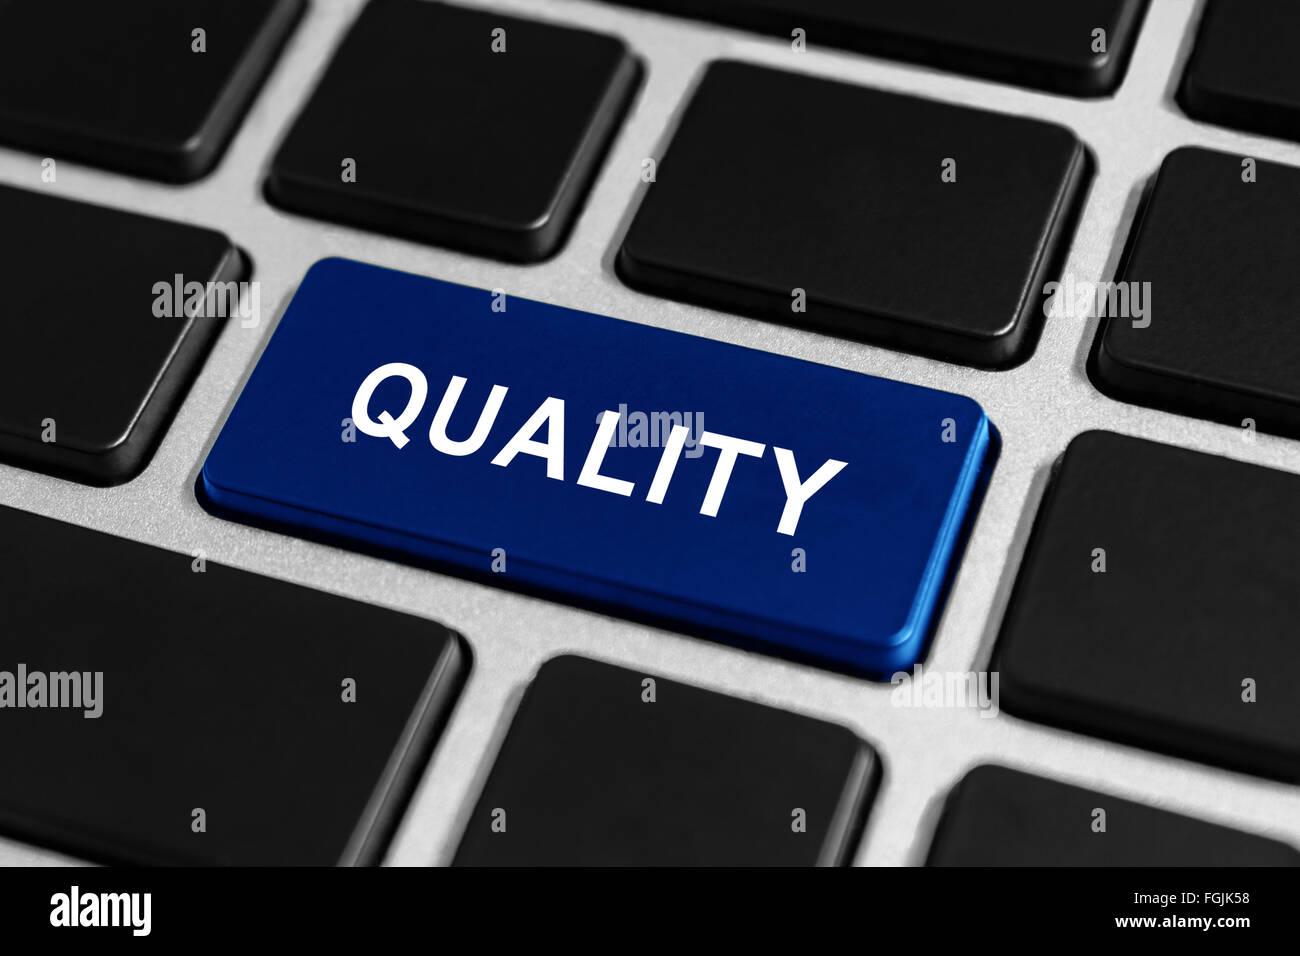 beste Qualität-Taste auf Tastatur, Business-Konzept Stockbild